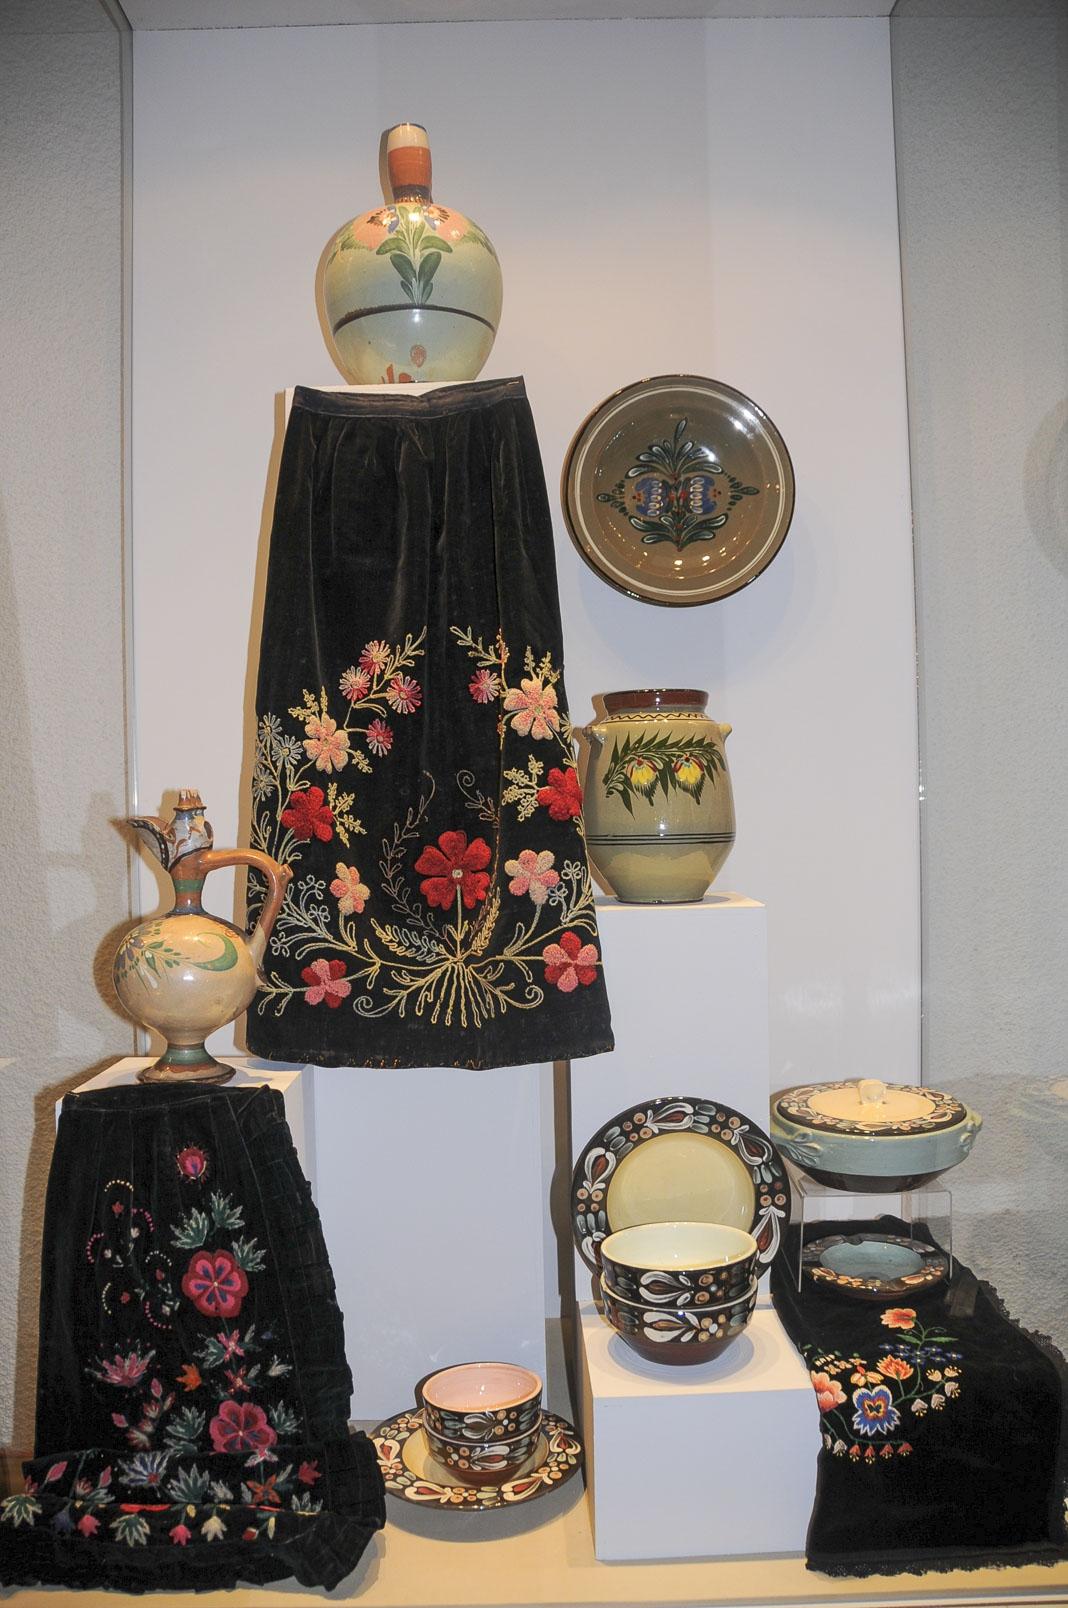 troyan-museum-cvetqta-na-zografa-2